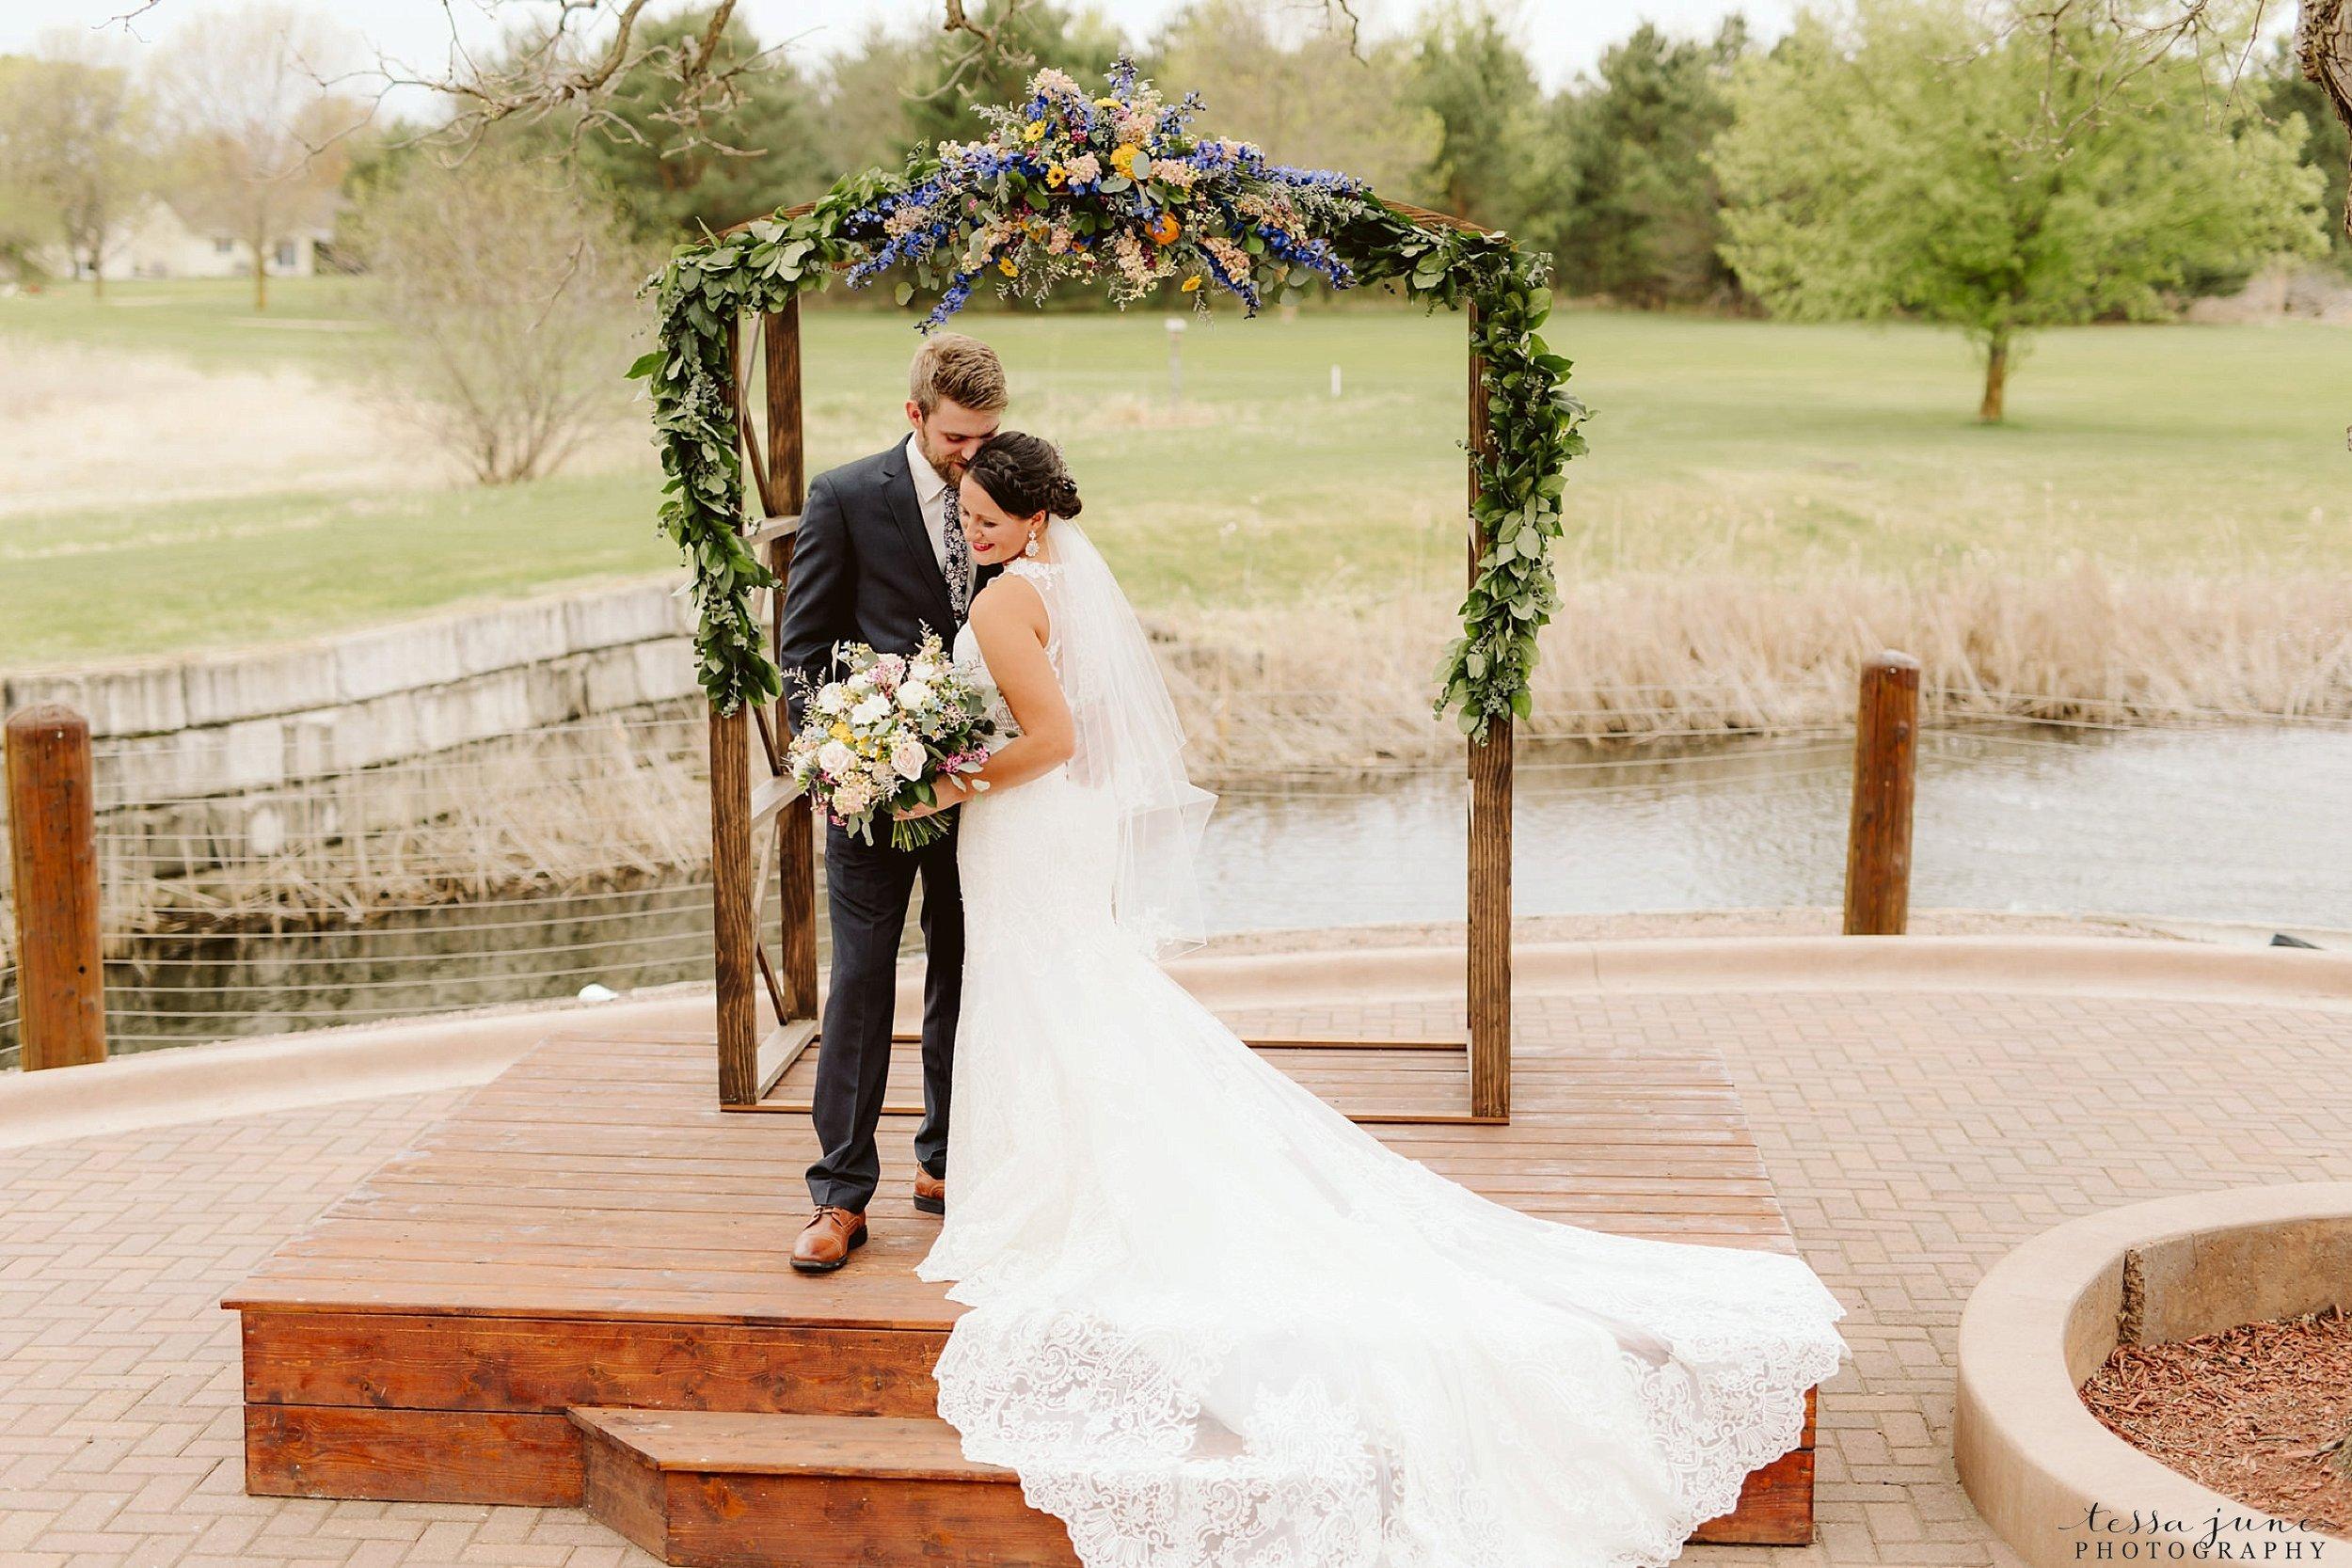 The-grands-at-mulligans-wedding-sartell-minnesota-spring-floral-spring-garden-wedding-46.jpg